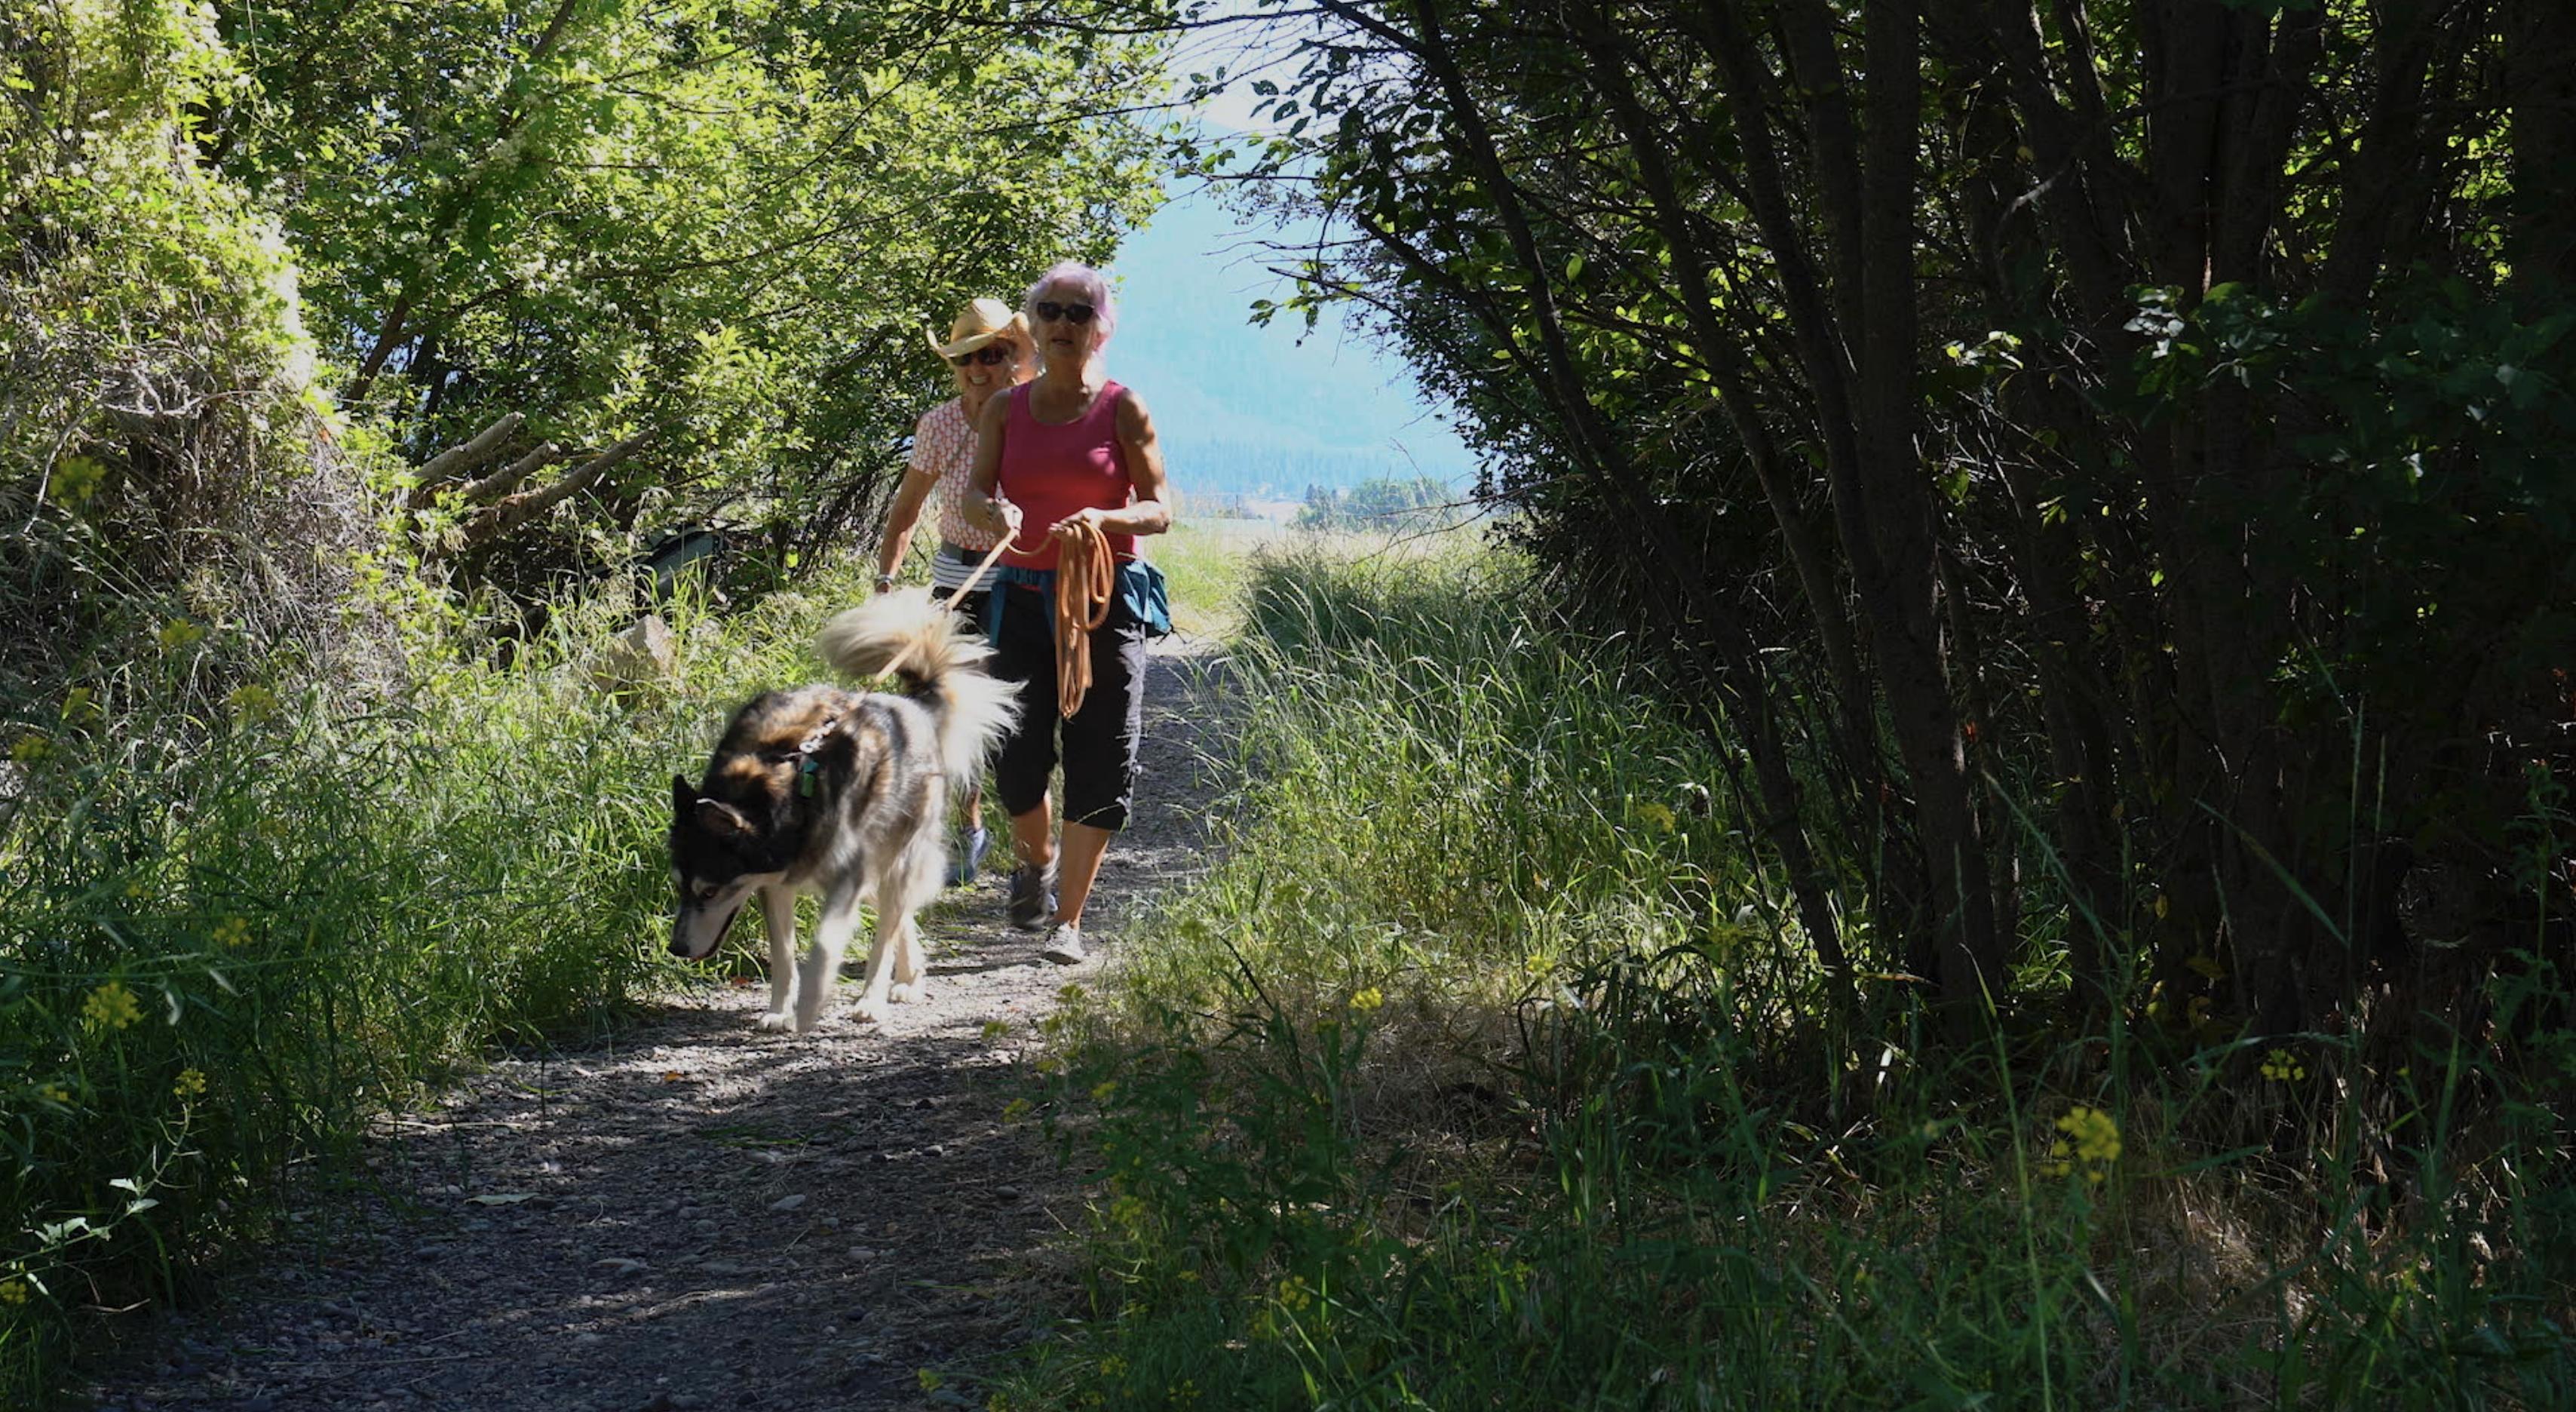 Dog walkers in summer